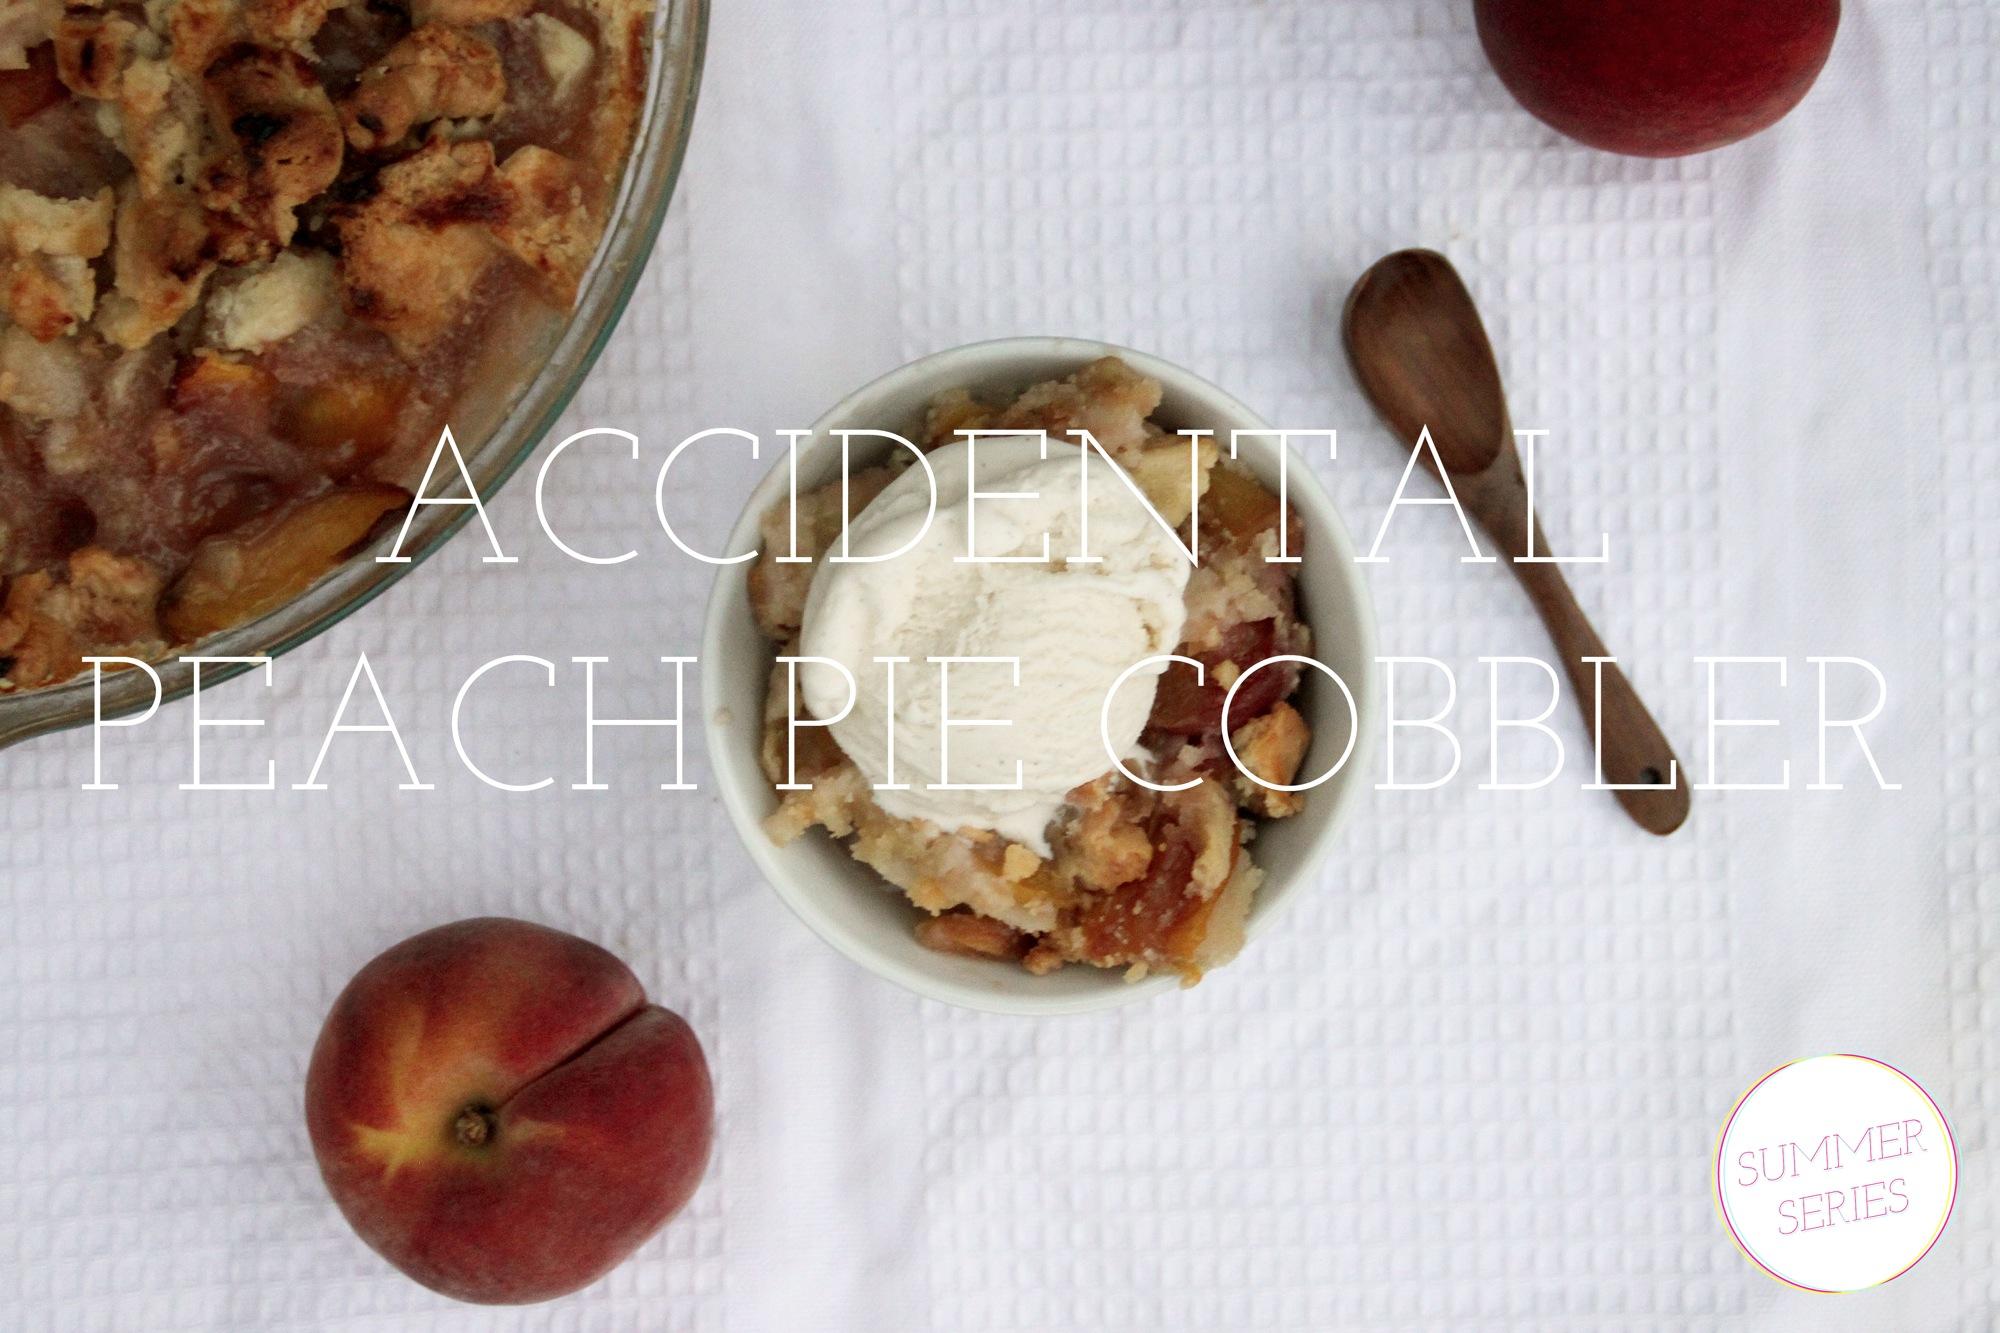 Accidental Cream Pie Delightful from the kitchen: {accidental} peach pie cobbler | {love+cupcakes